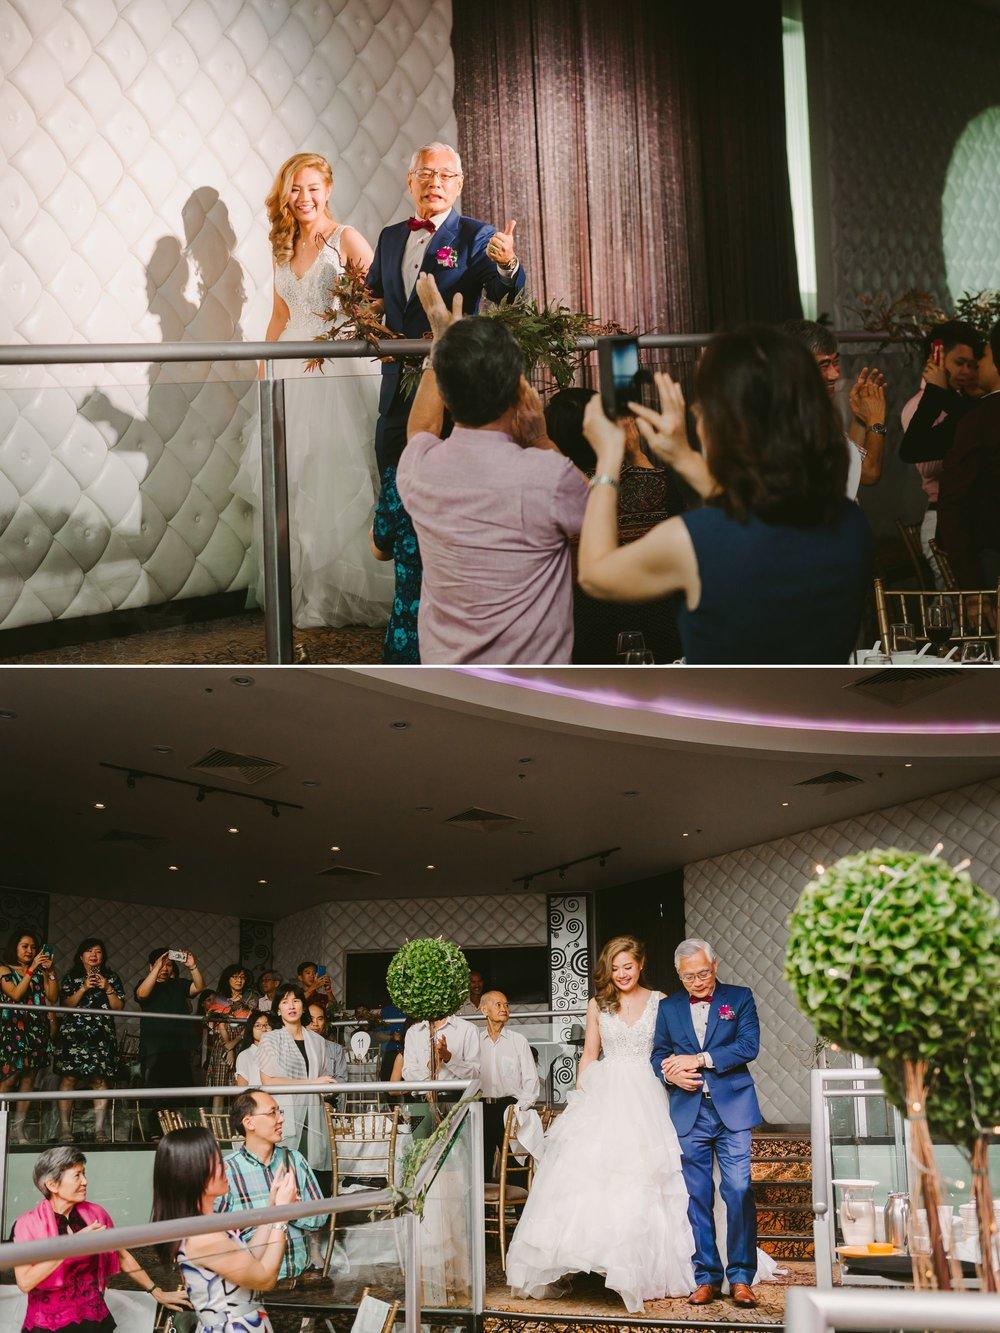 wedding_photographer_singapore 34.jpg